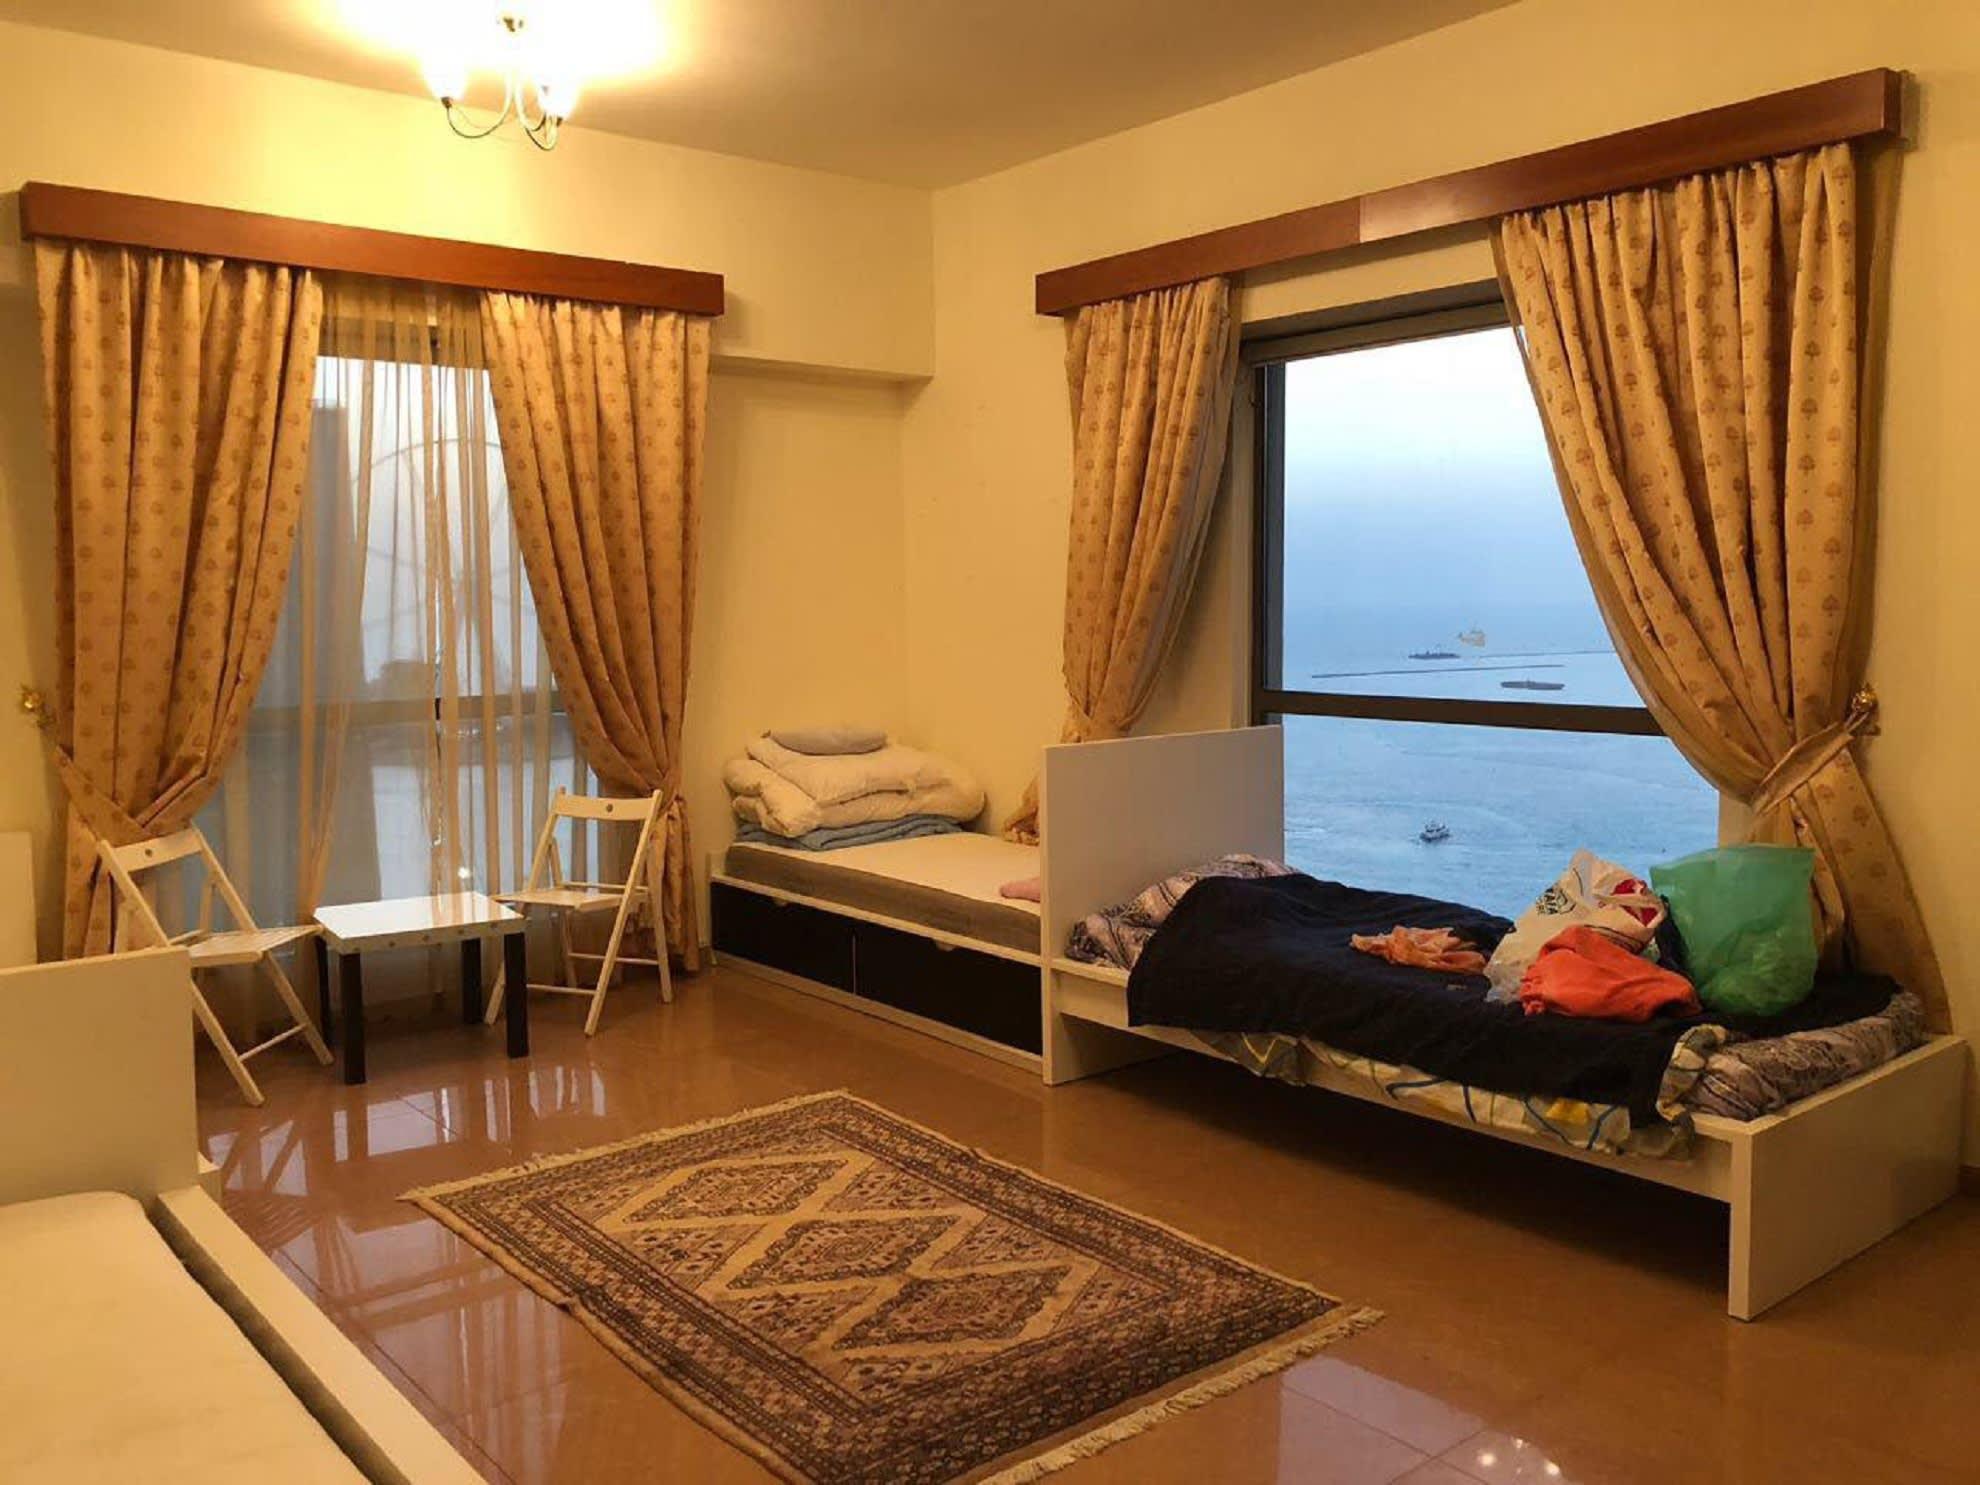 HOSTEL - JBR Beach Hostel for Ladies